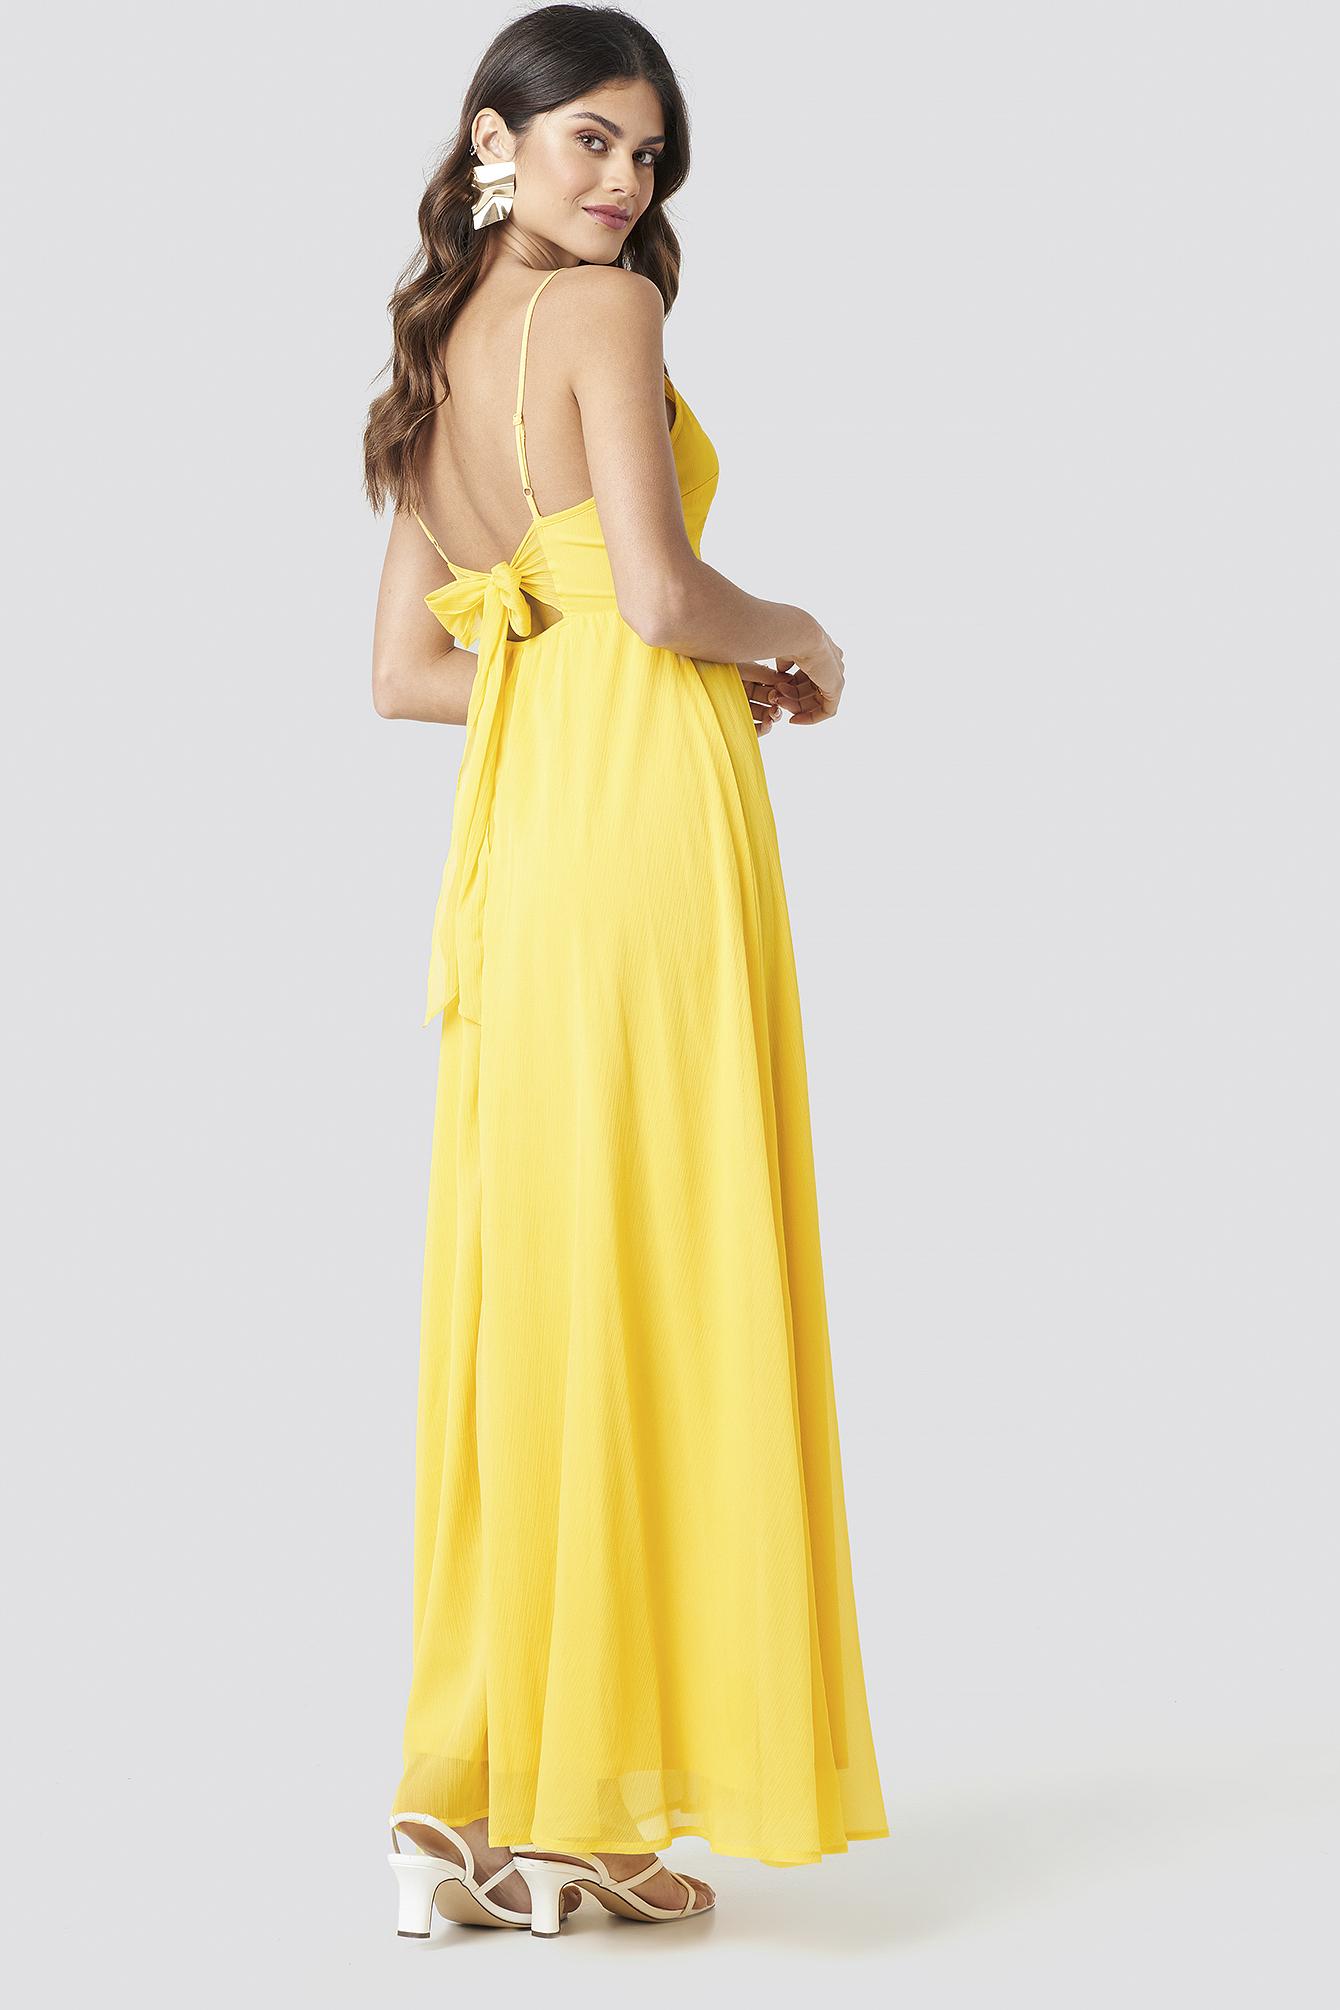 bca6ab1affb2 Tie Back Detail Maxi Dress Yellow | na-kd.com